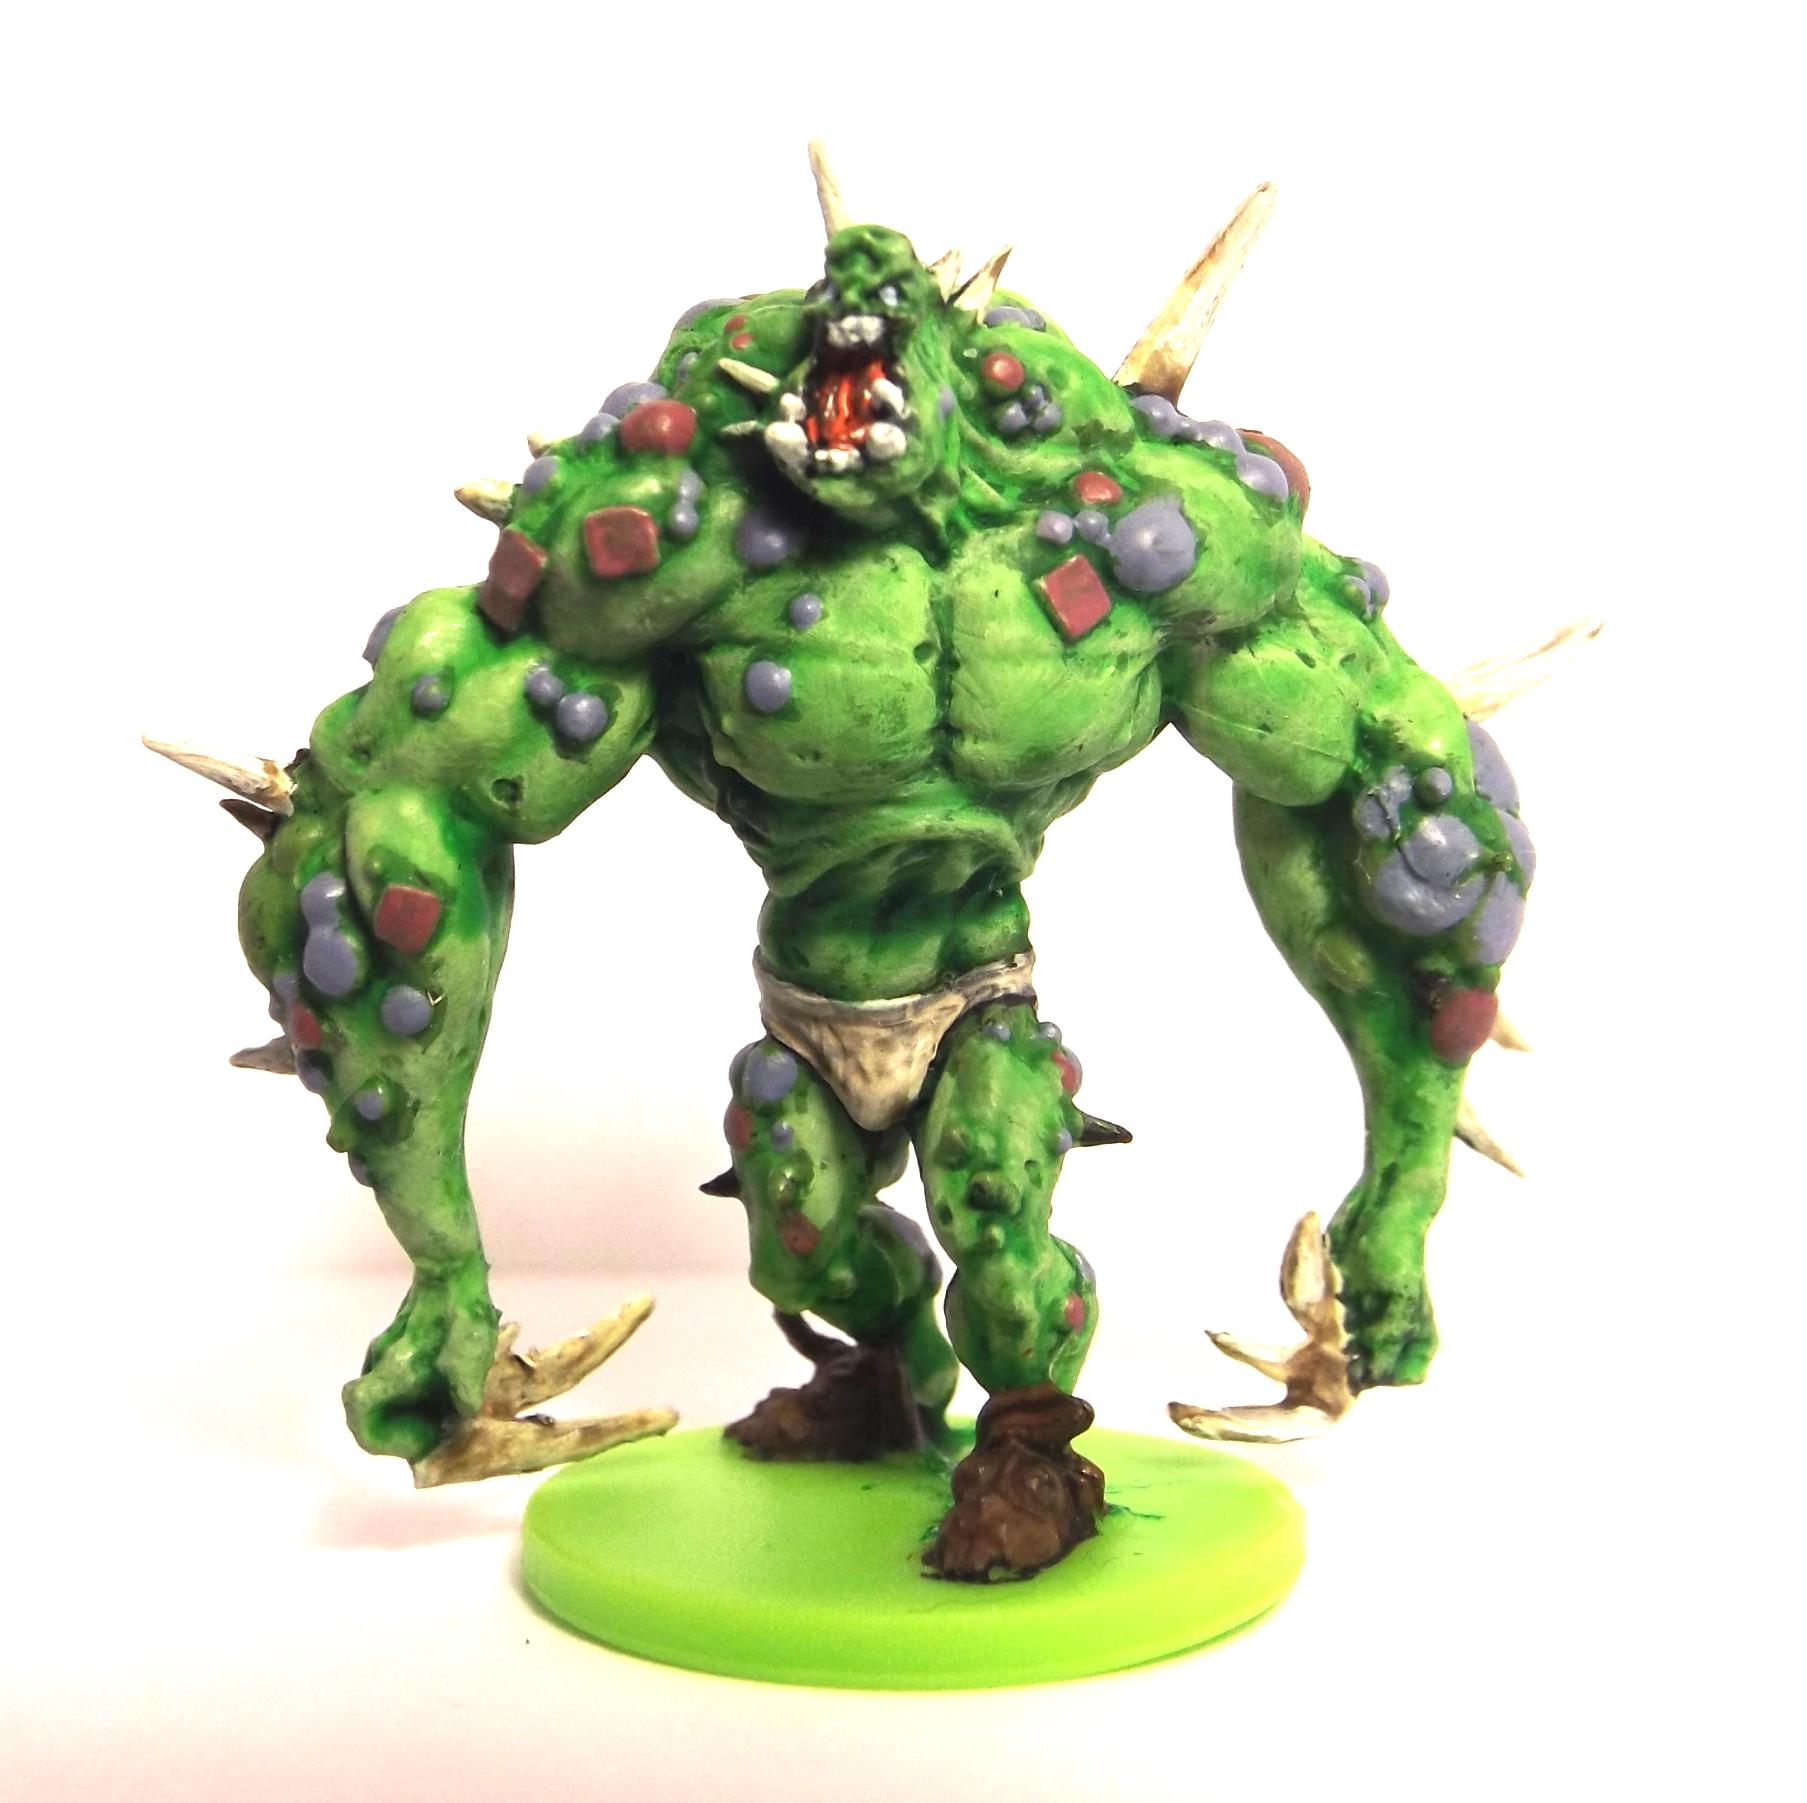 Toxic Abomination by robduckyworth